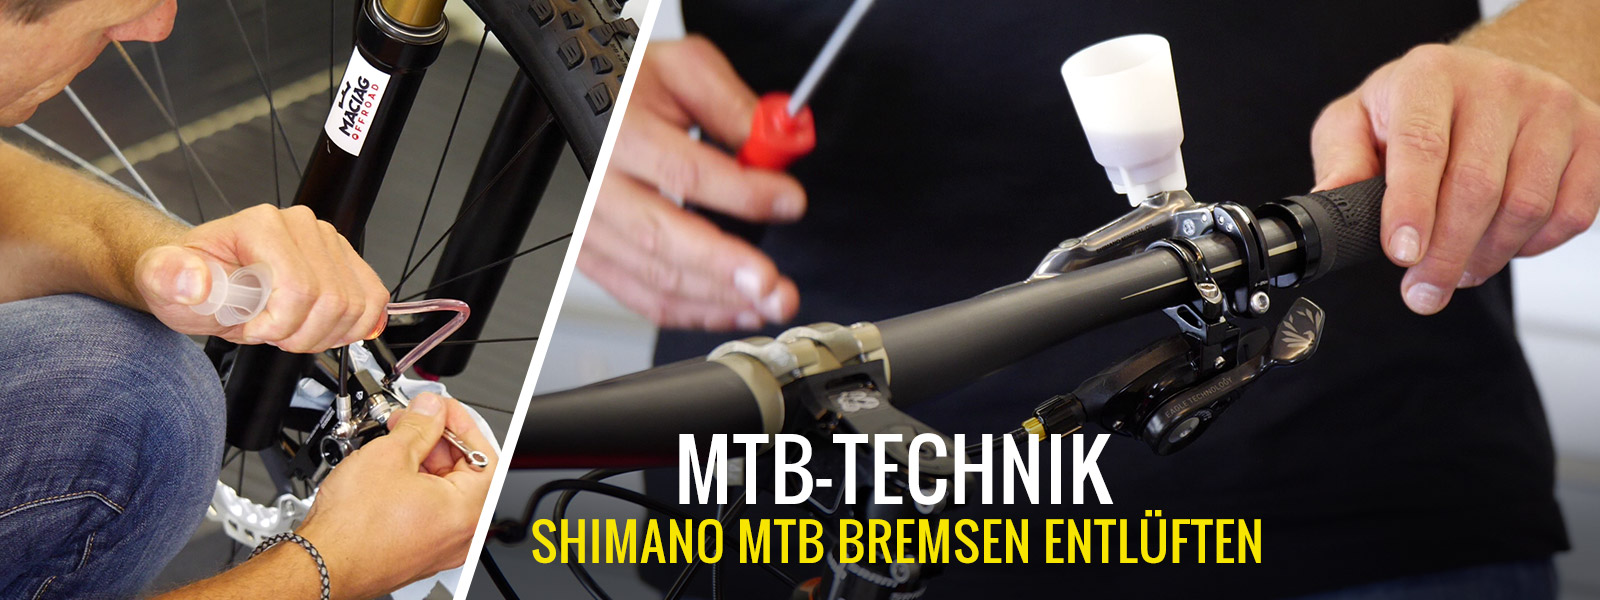 Shimano-Bremsen entlüften